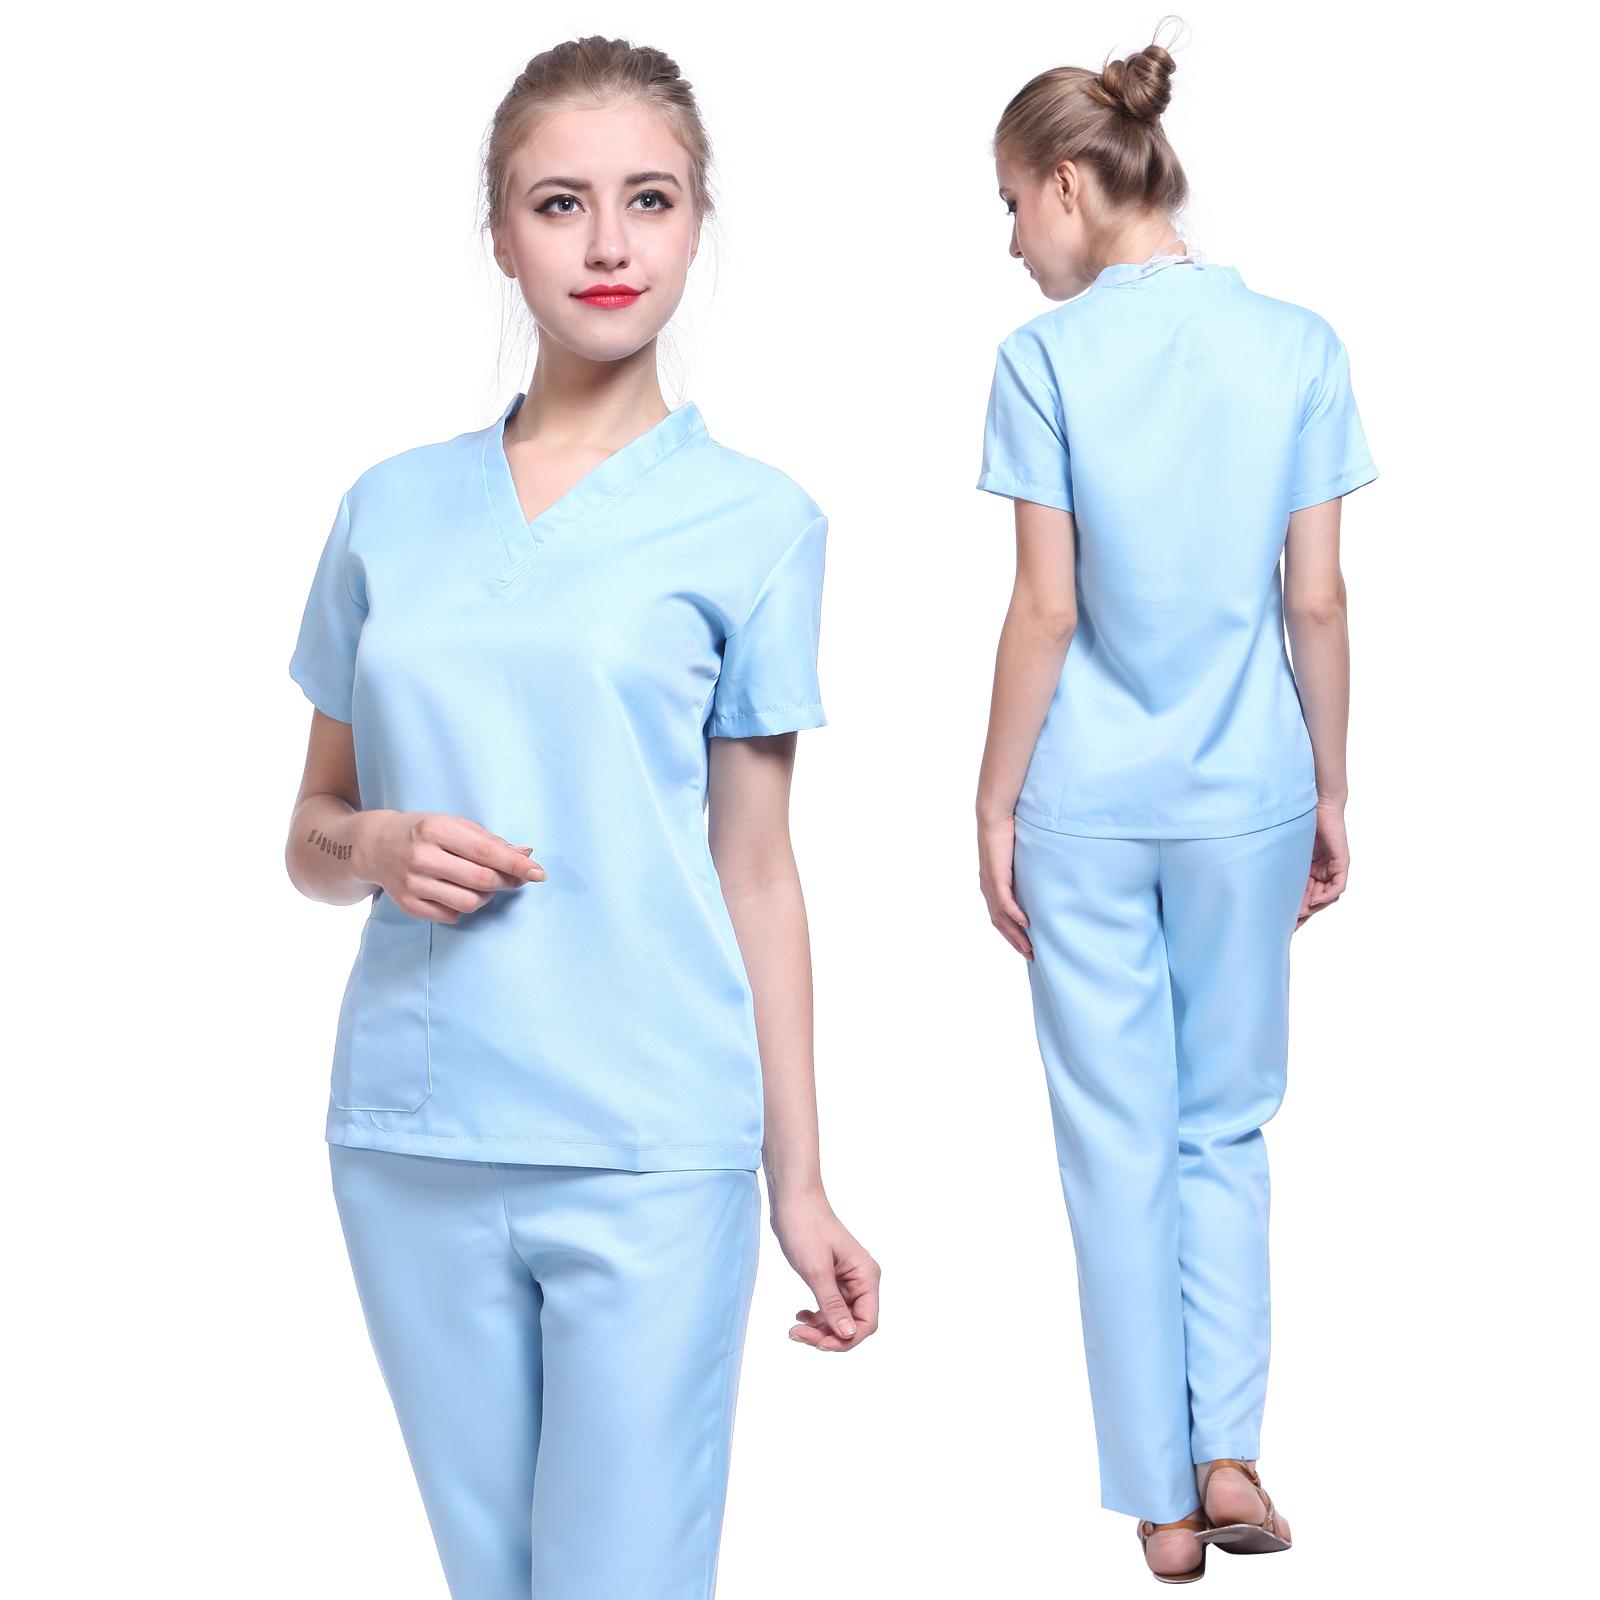 6af0bcc1b61 Details about Womens ER Scrubs Doctor Surgeon Hospital Nurse Uniform Fancy  Dress Costume